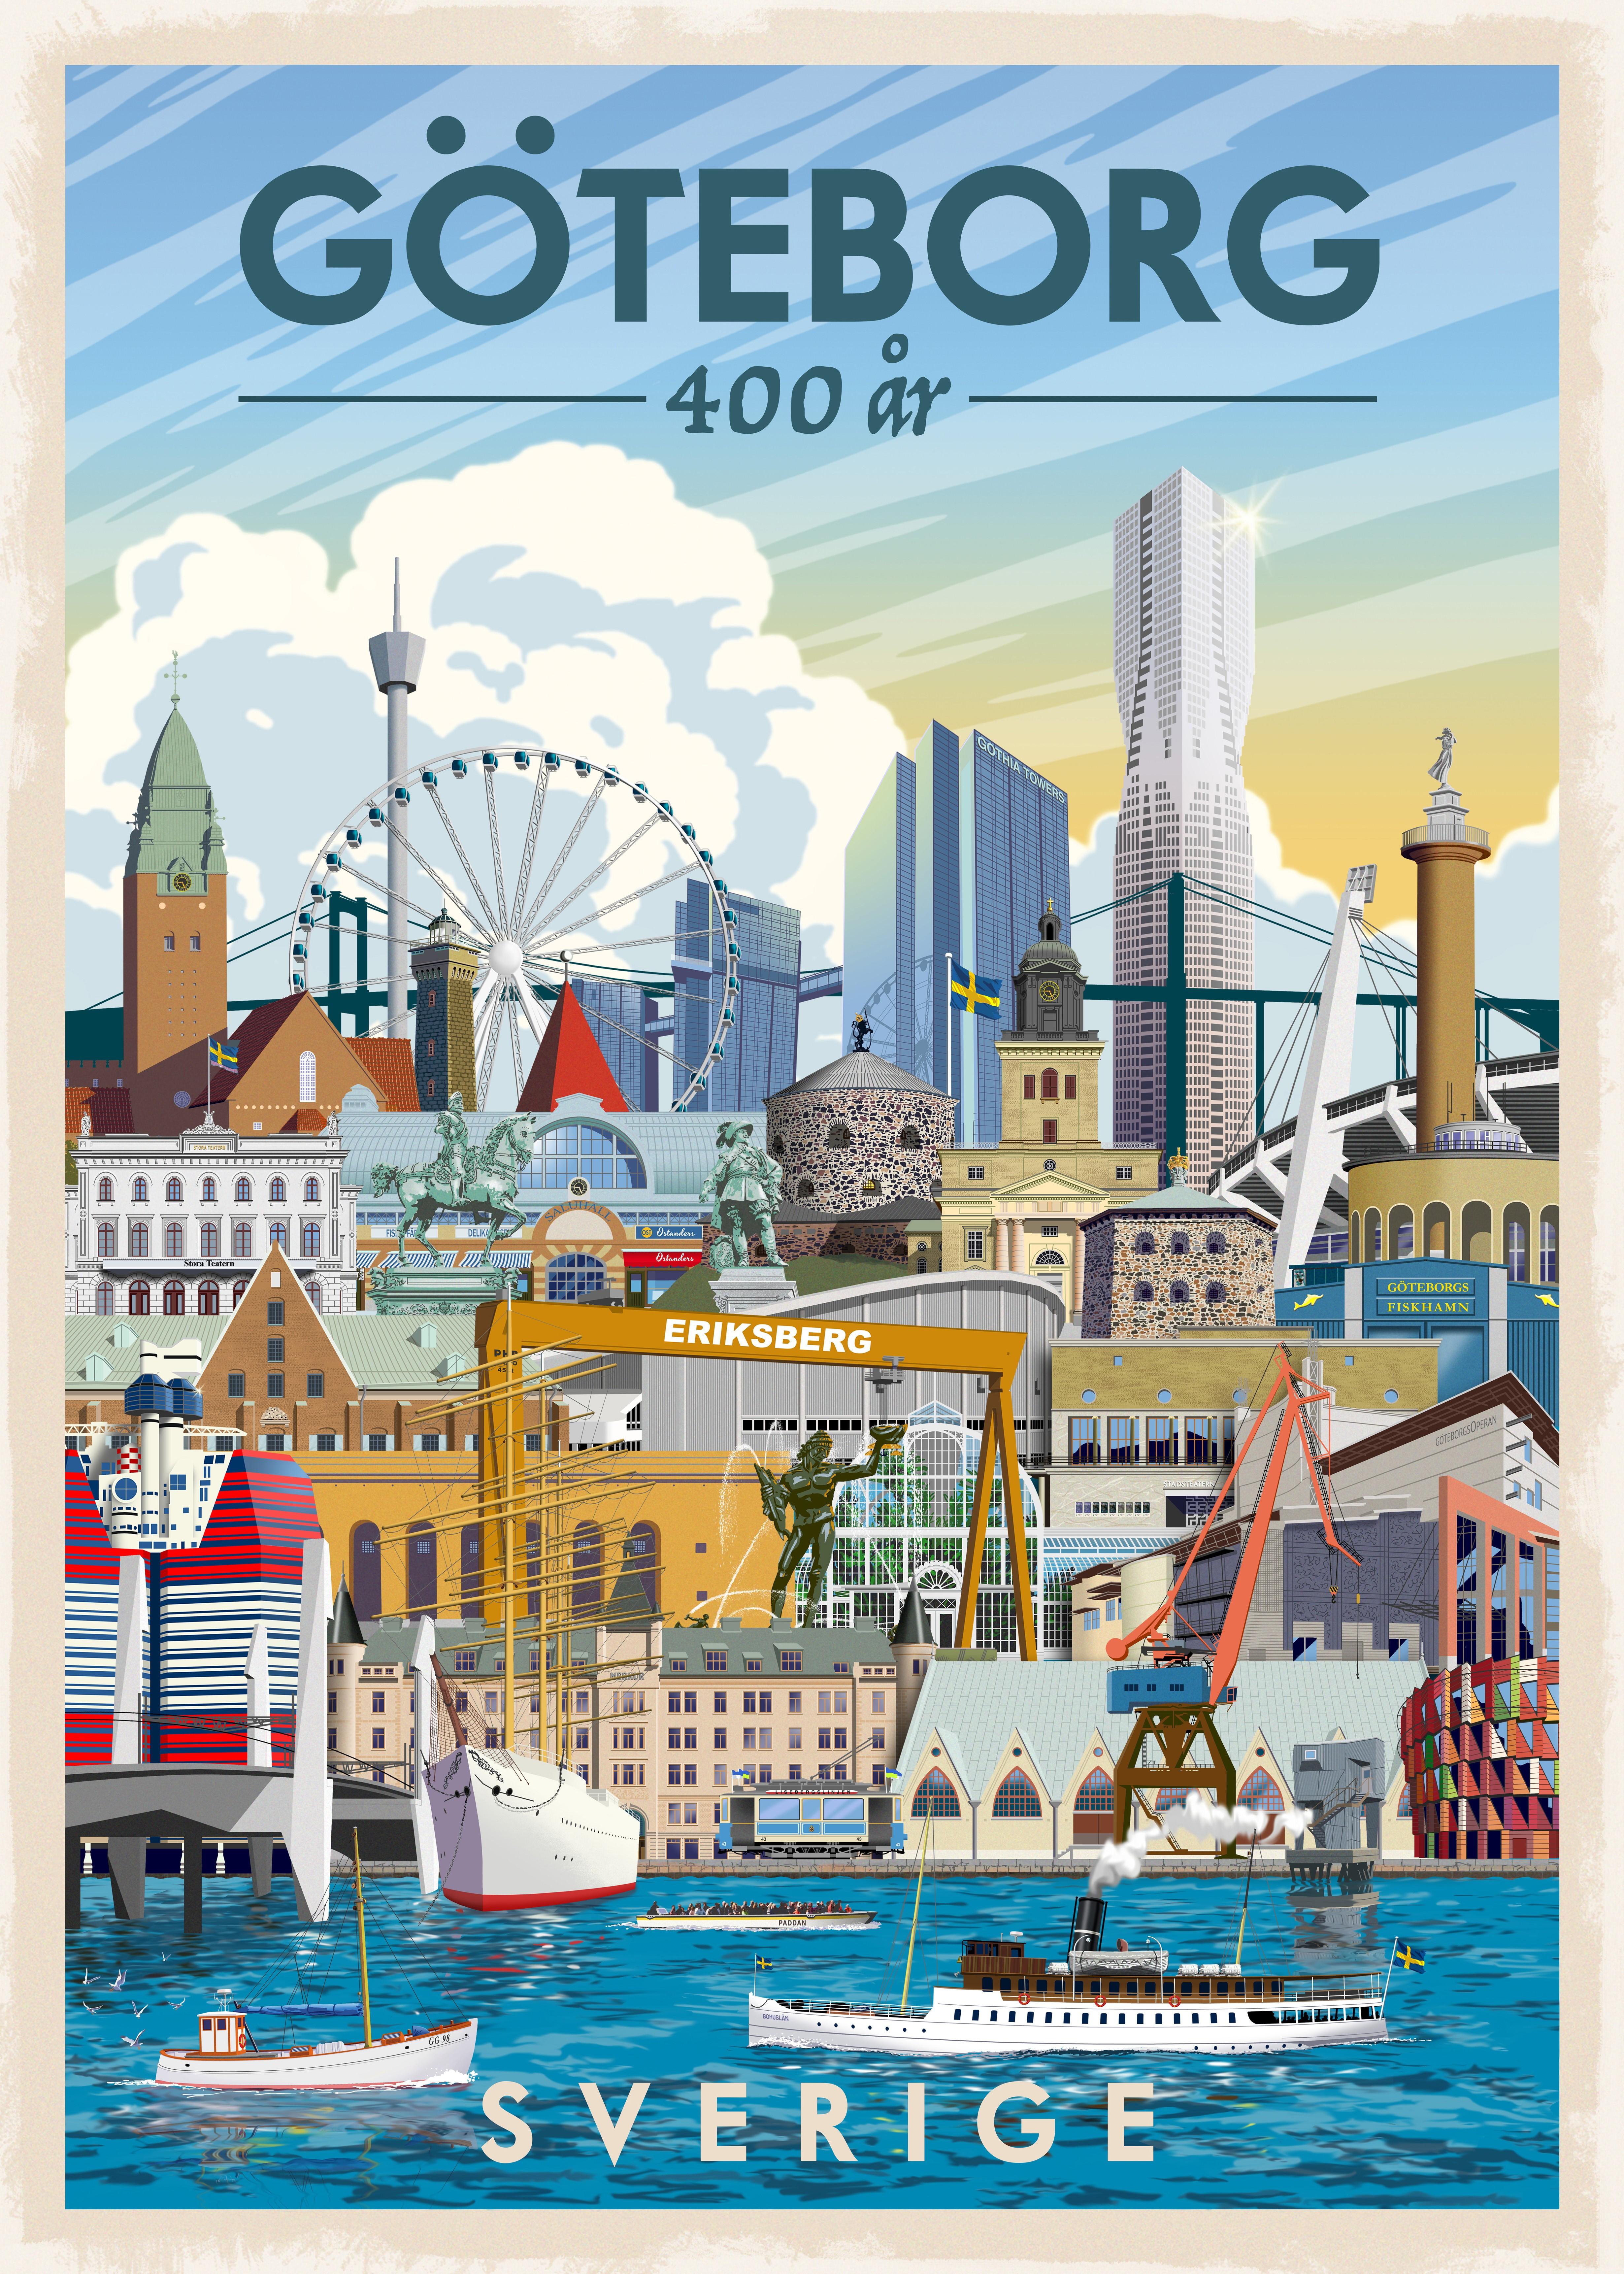 ThomasO Poster 30x40 Göteborg 400 år